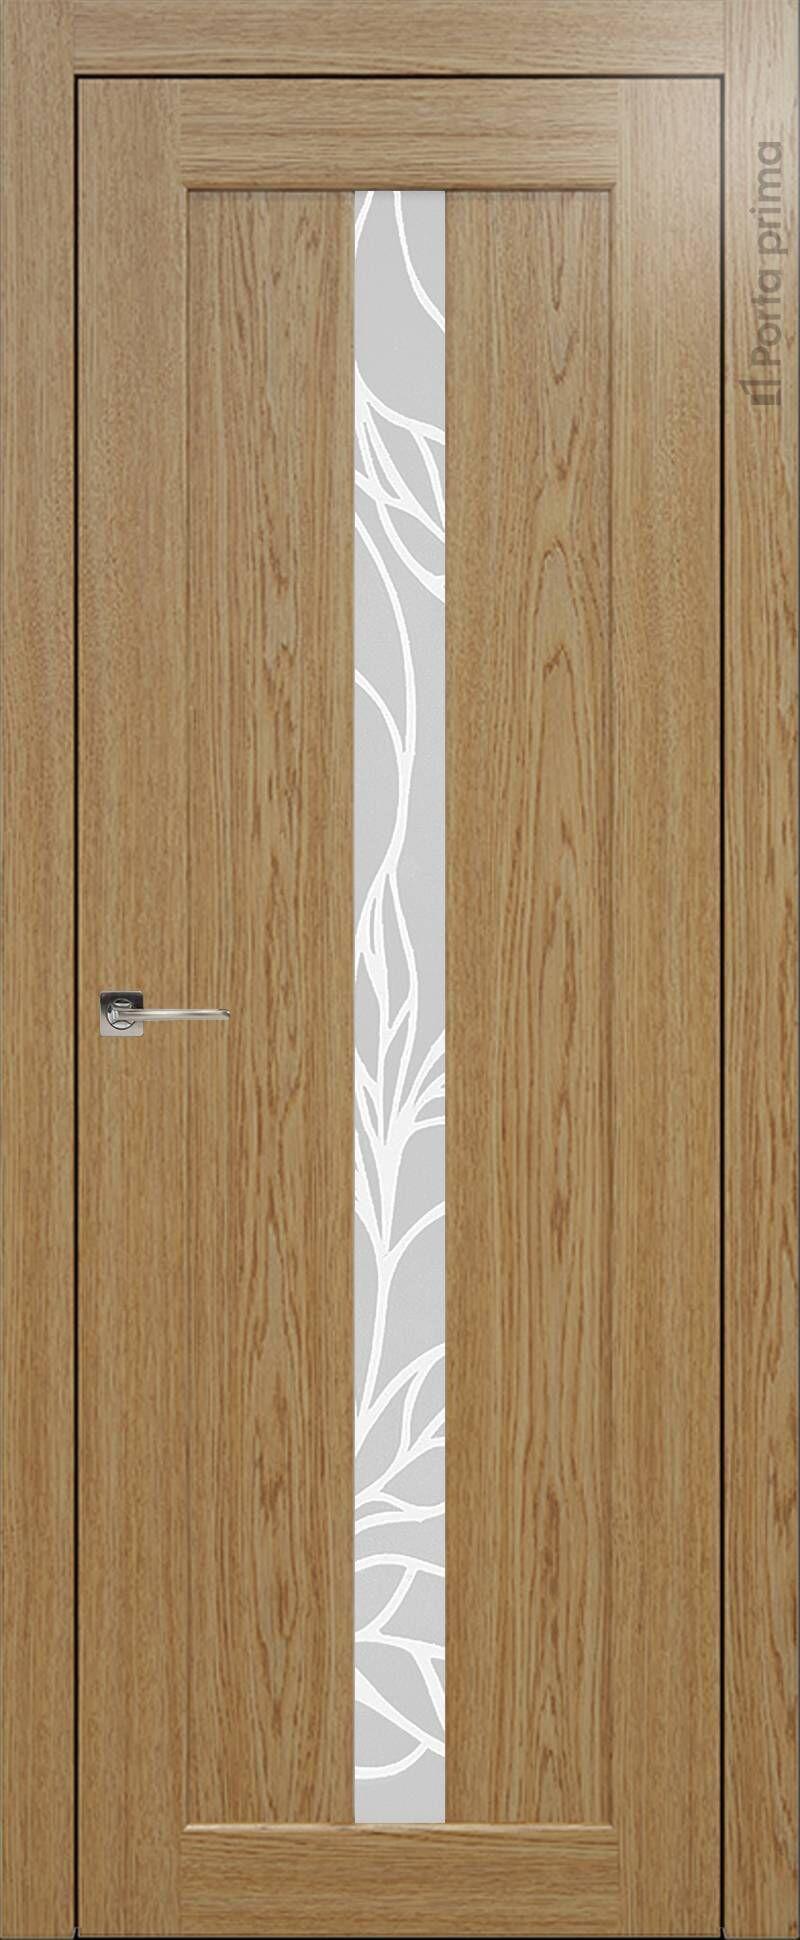 Pianta цвет - Дуб карамель Без стекла (ДГ)